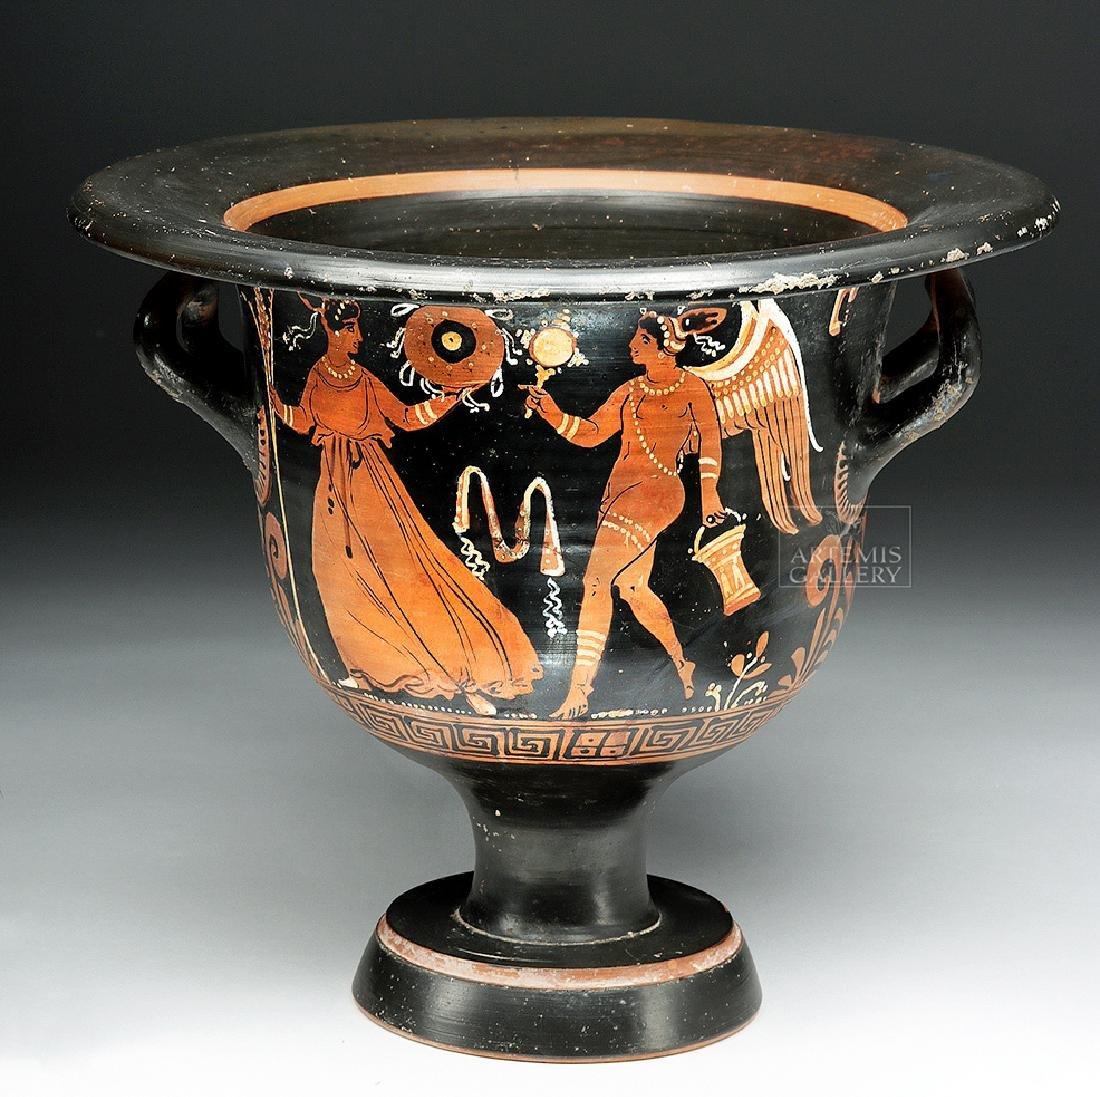 Greek Apulian Bell Krater - Eros & Maenad